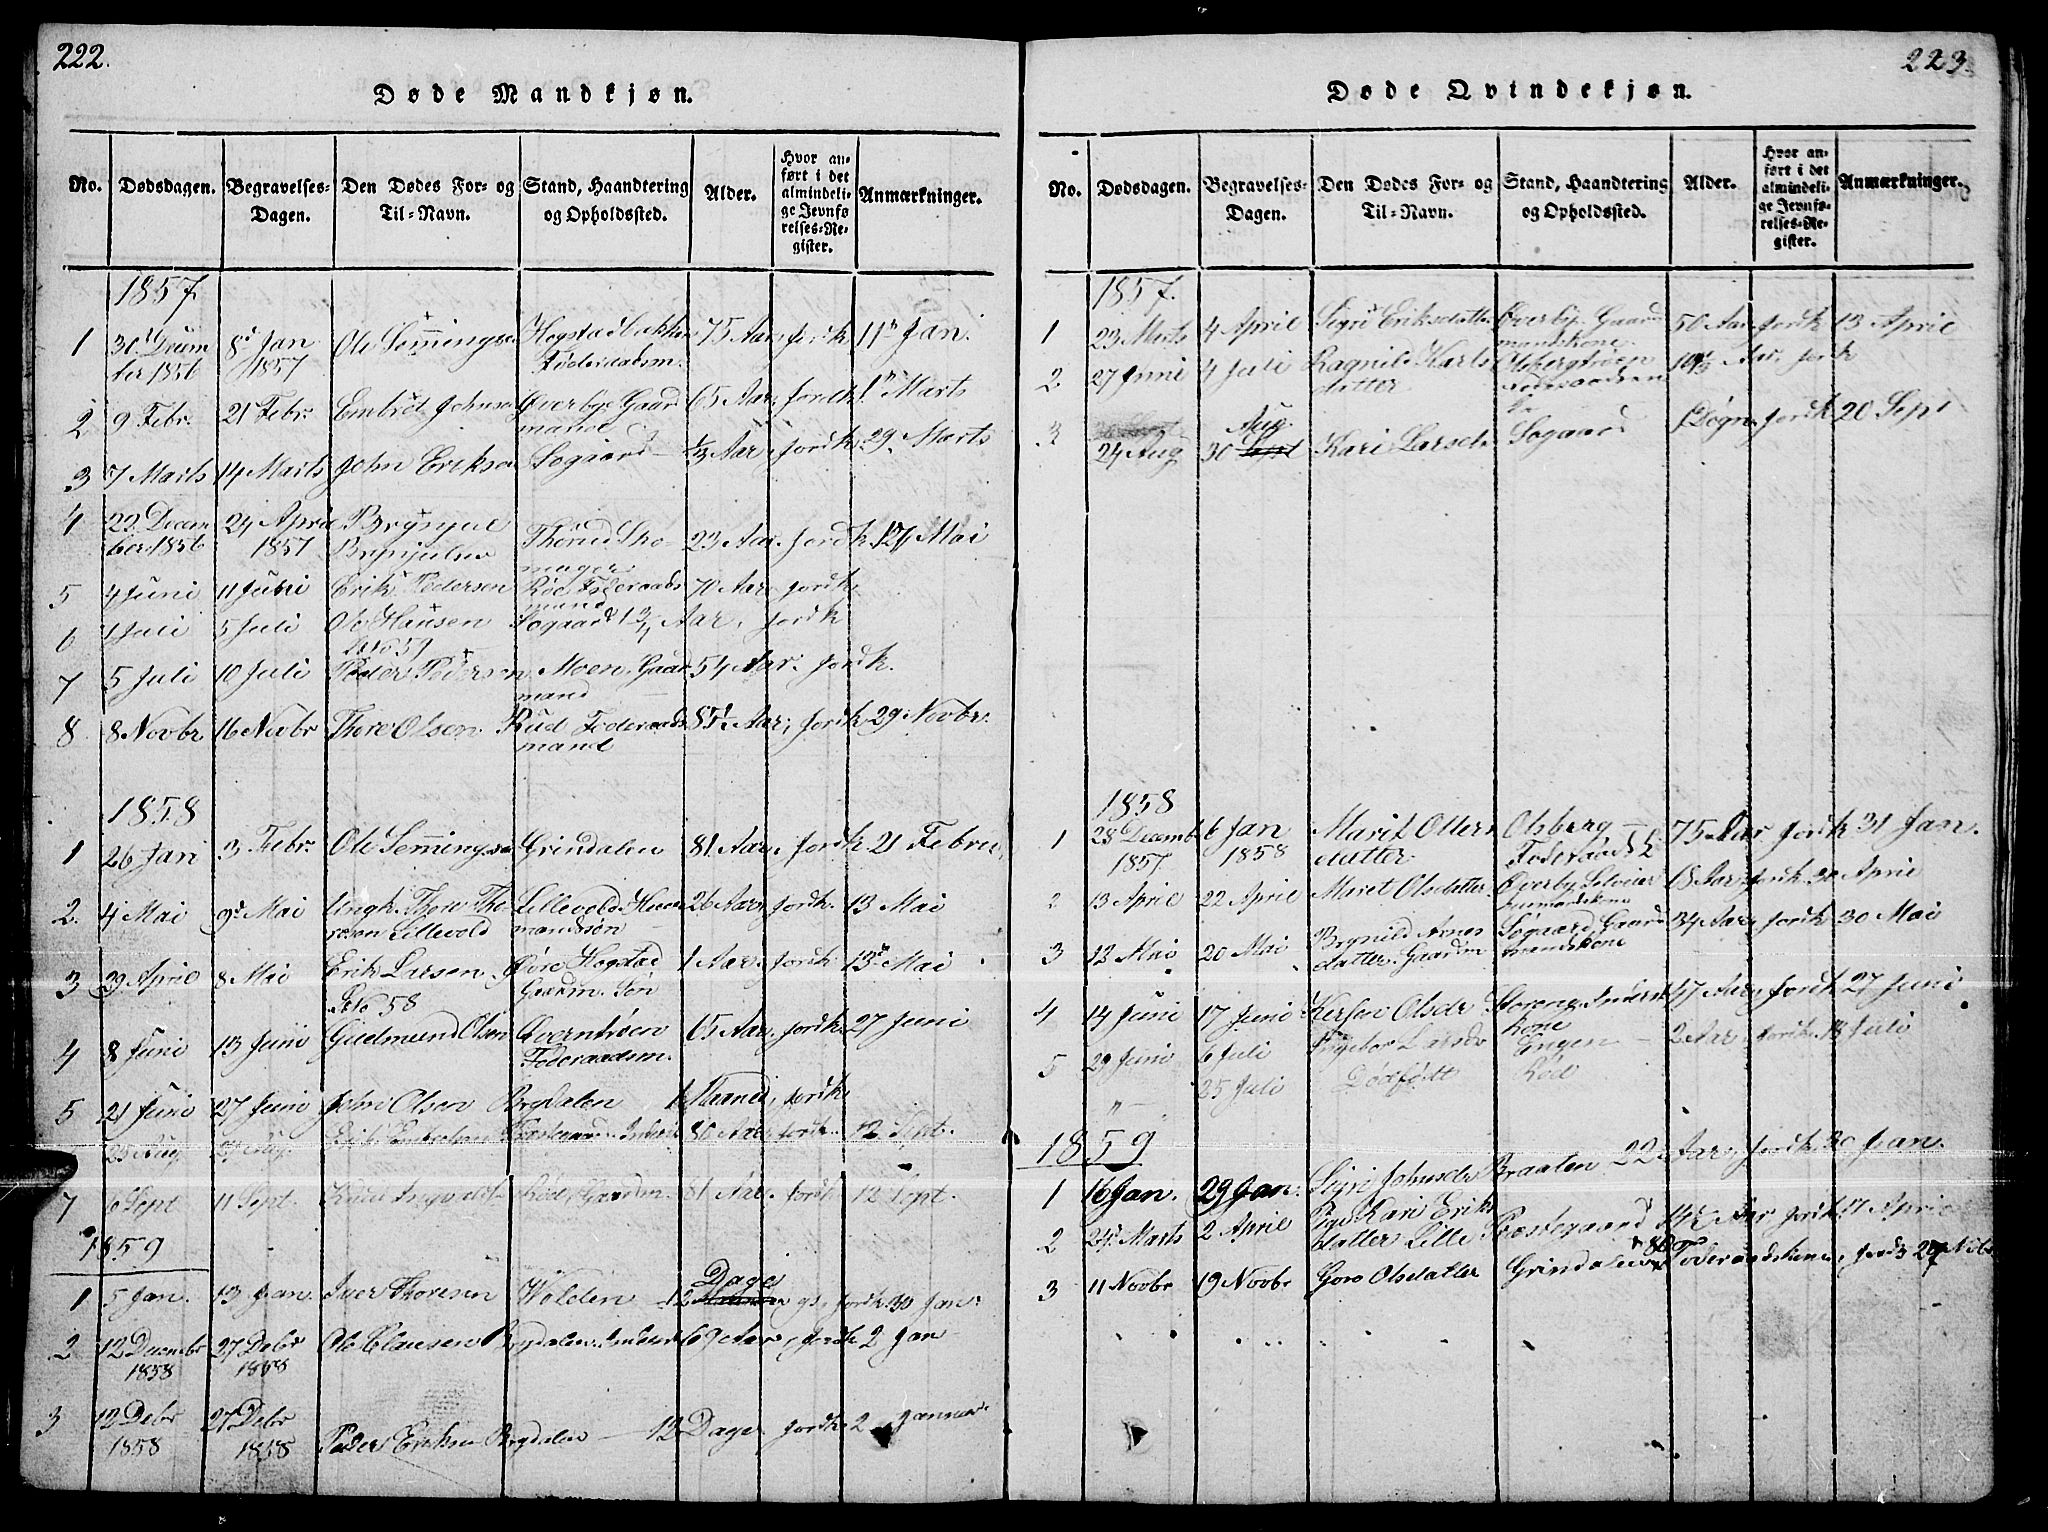 SAH, Tynset prestekontor, Klokkerbok nr. 4, 1814-1879, s. 222-223